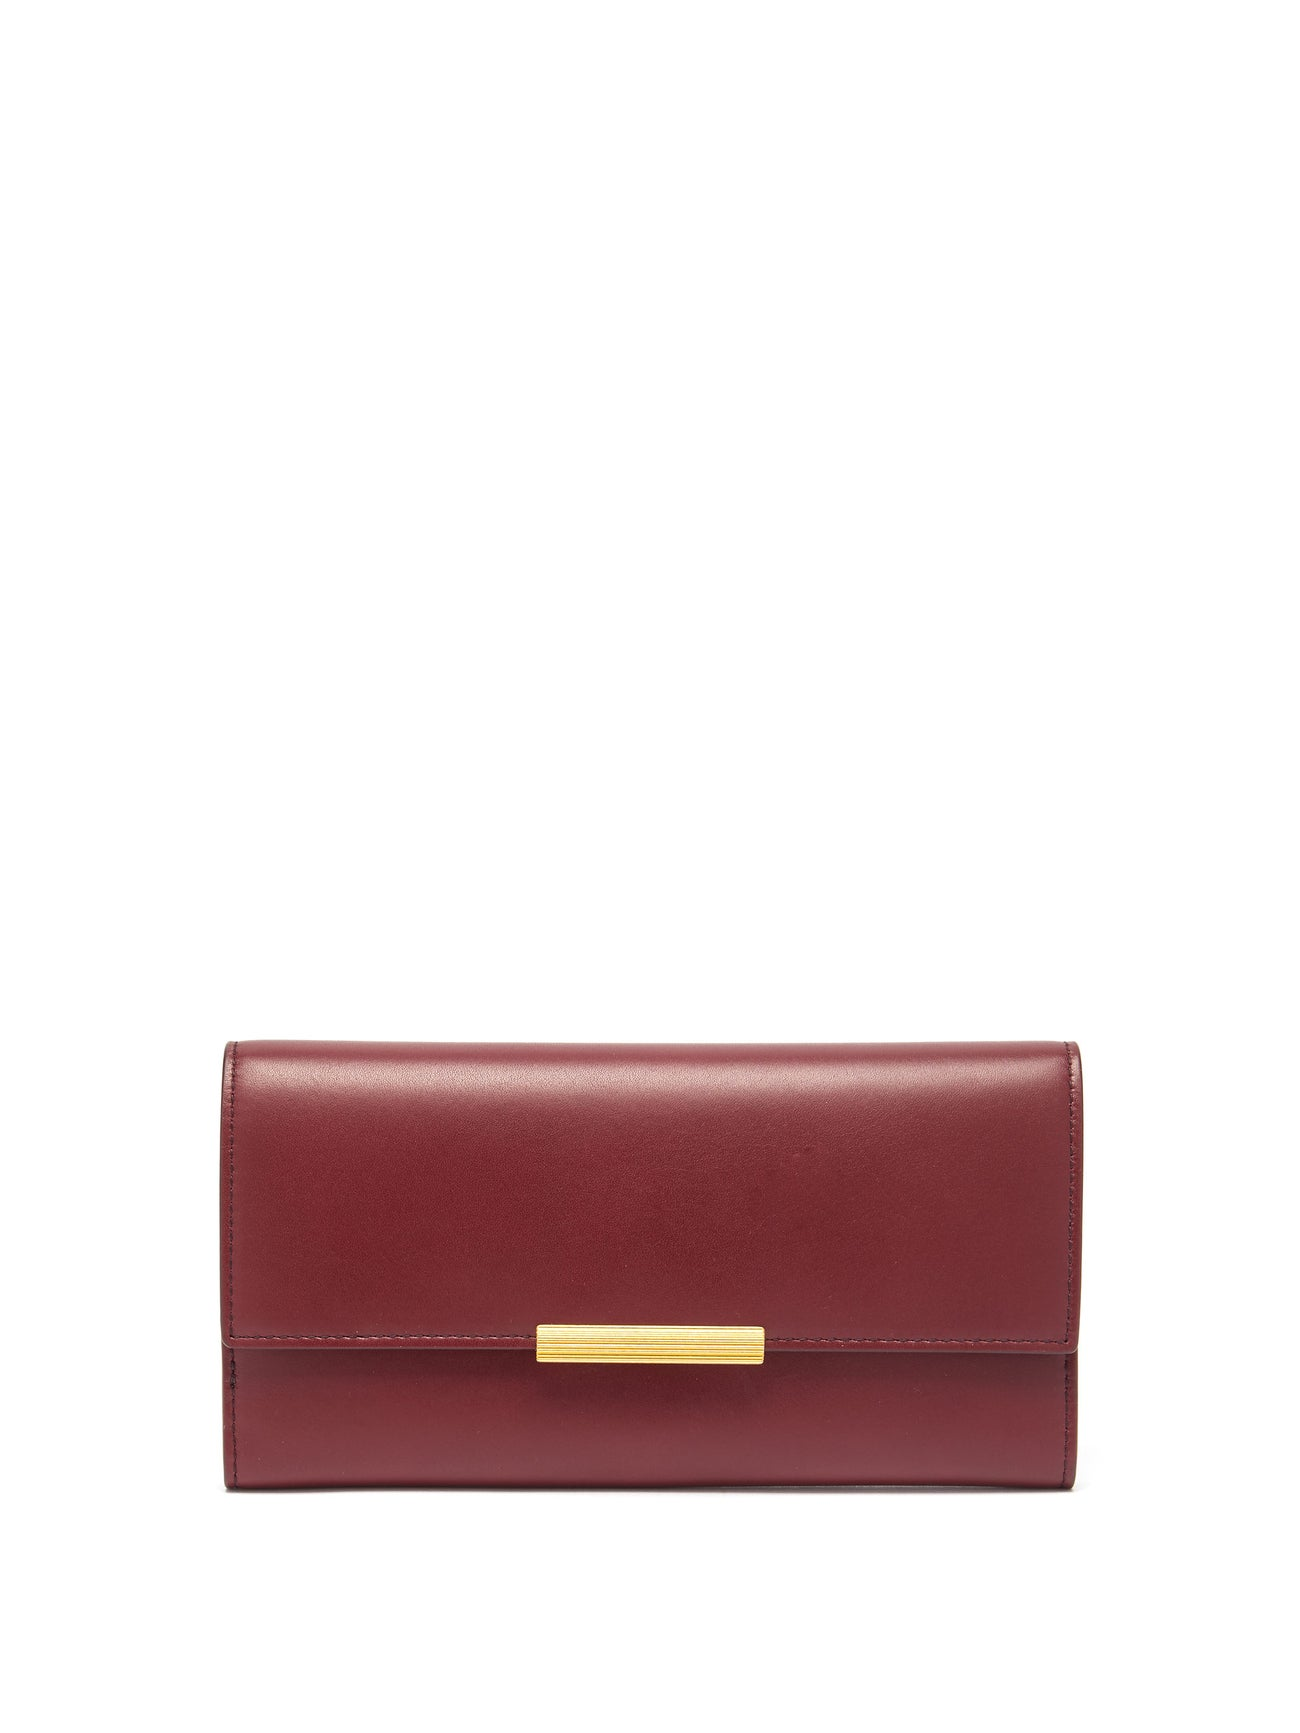 Bottega Veneta Continental Leather Wallet 1309лв